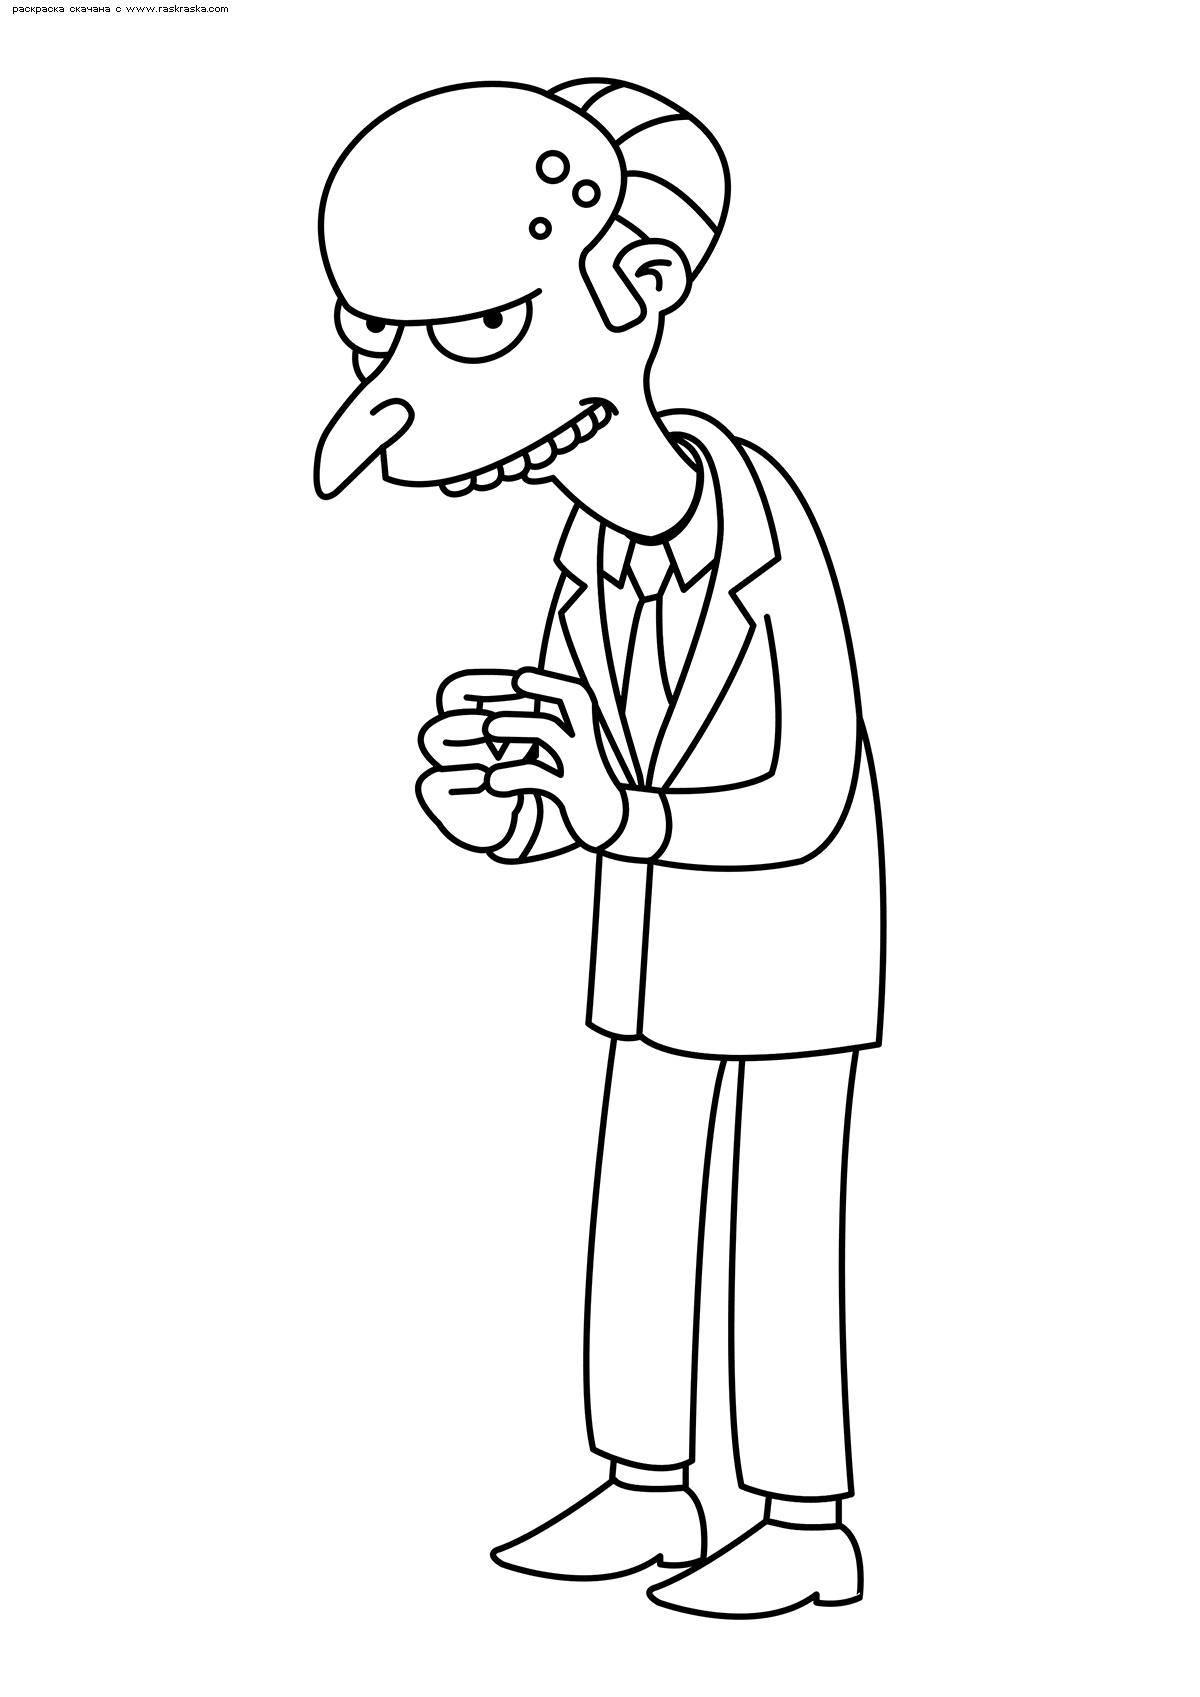 Раскраска Мистер Бёрнс. Раскраска Симпсоны